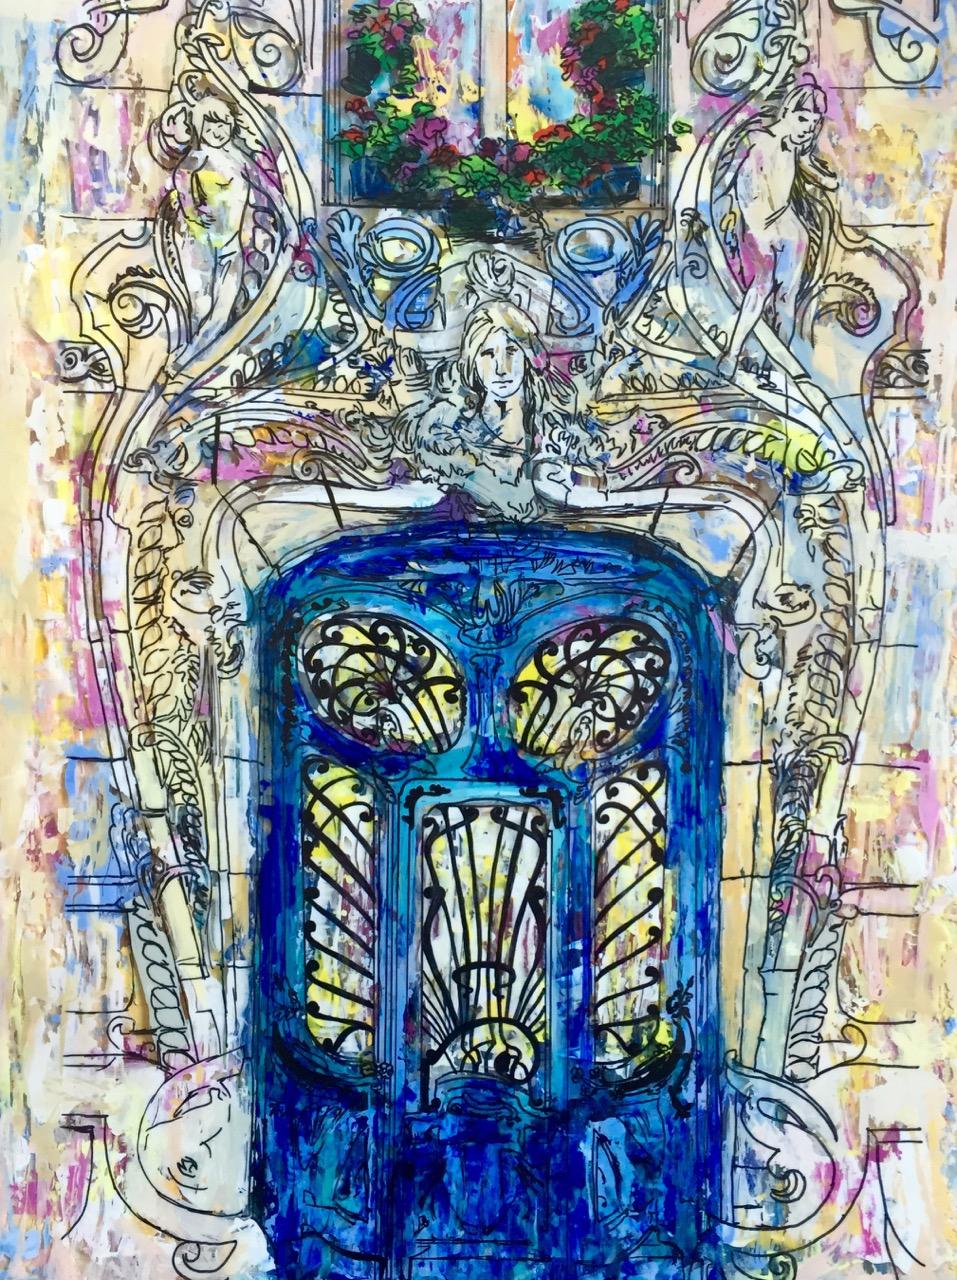 "LA PORTE LAVIROTTE,PARIS   11 X 14""   Acrylic, ink, acetate, and epoxy resin on canvas    2016    SOLD"